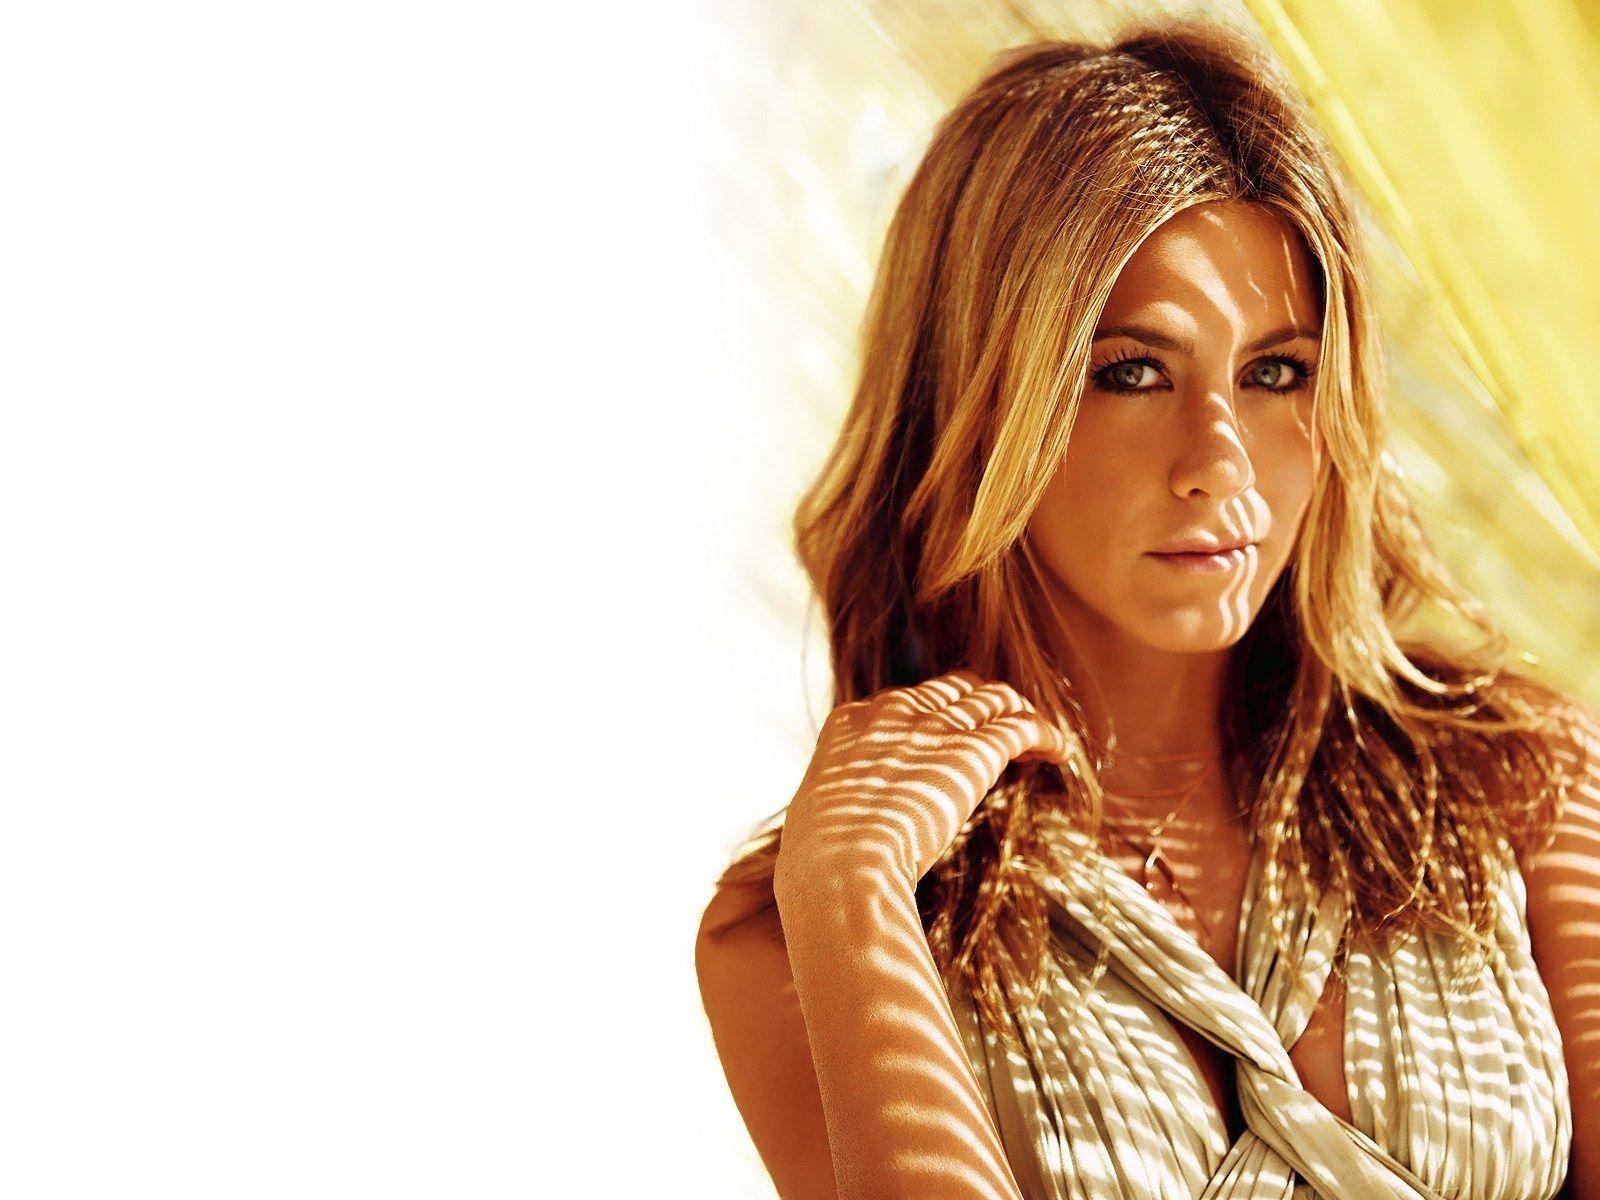 Jennifer Aniston Wallpaper 1 Always Sexy The Best Looking Female